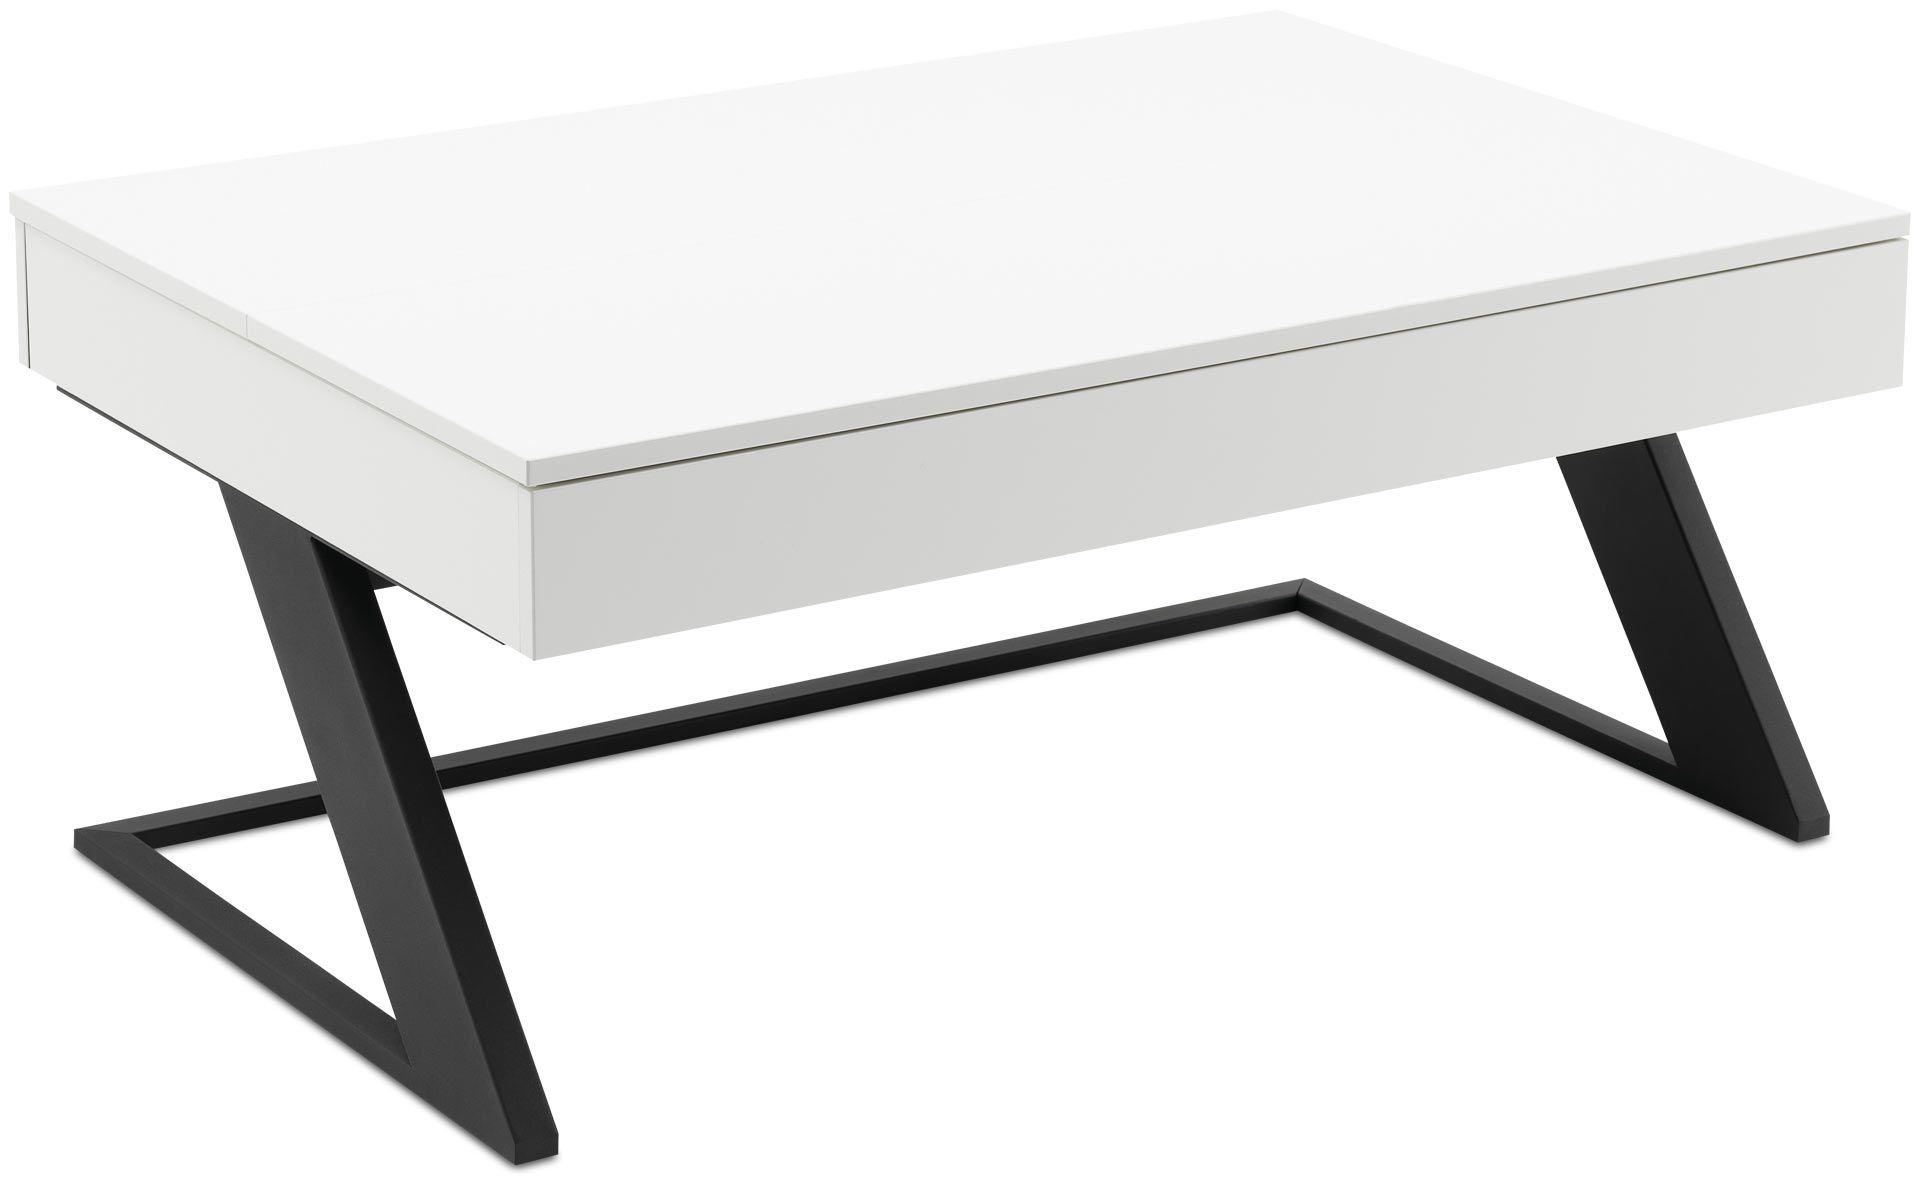 designer couchtische aus holz glas kaufen boconcept. Black Bedroom Furniture Sets. Home Design Ideas